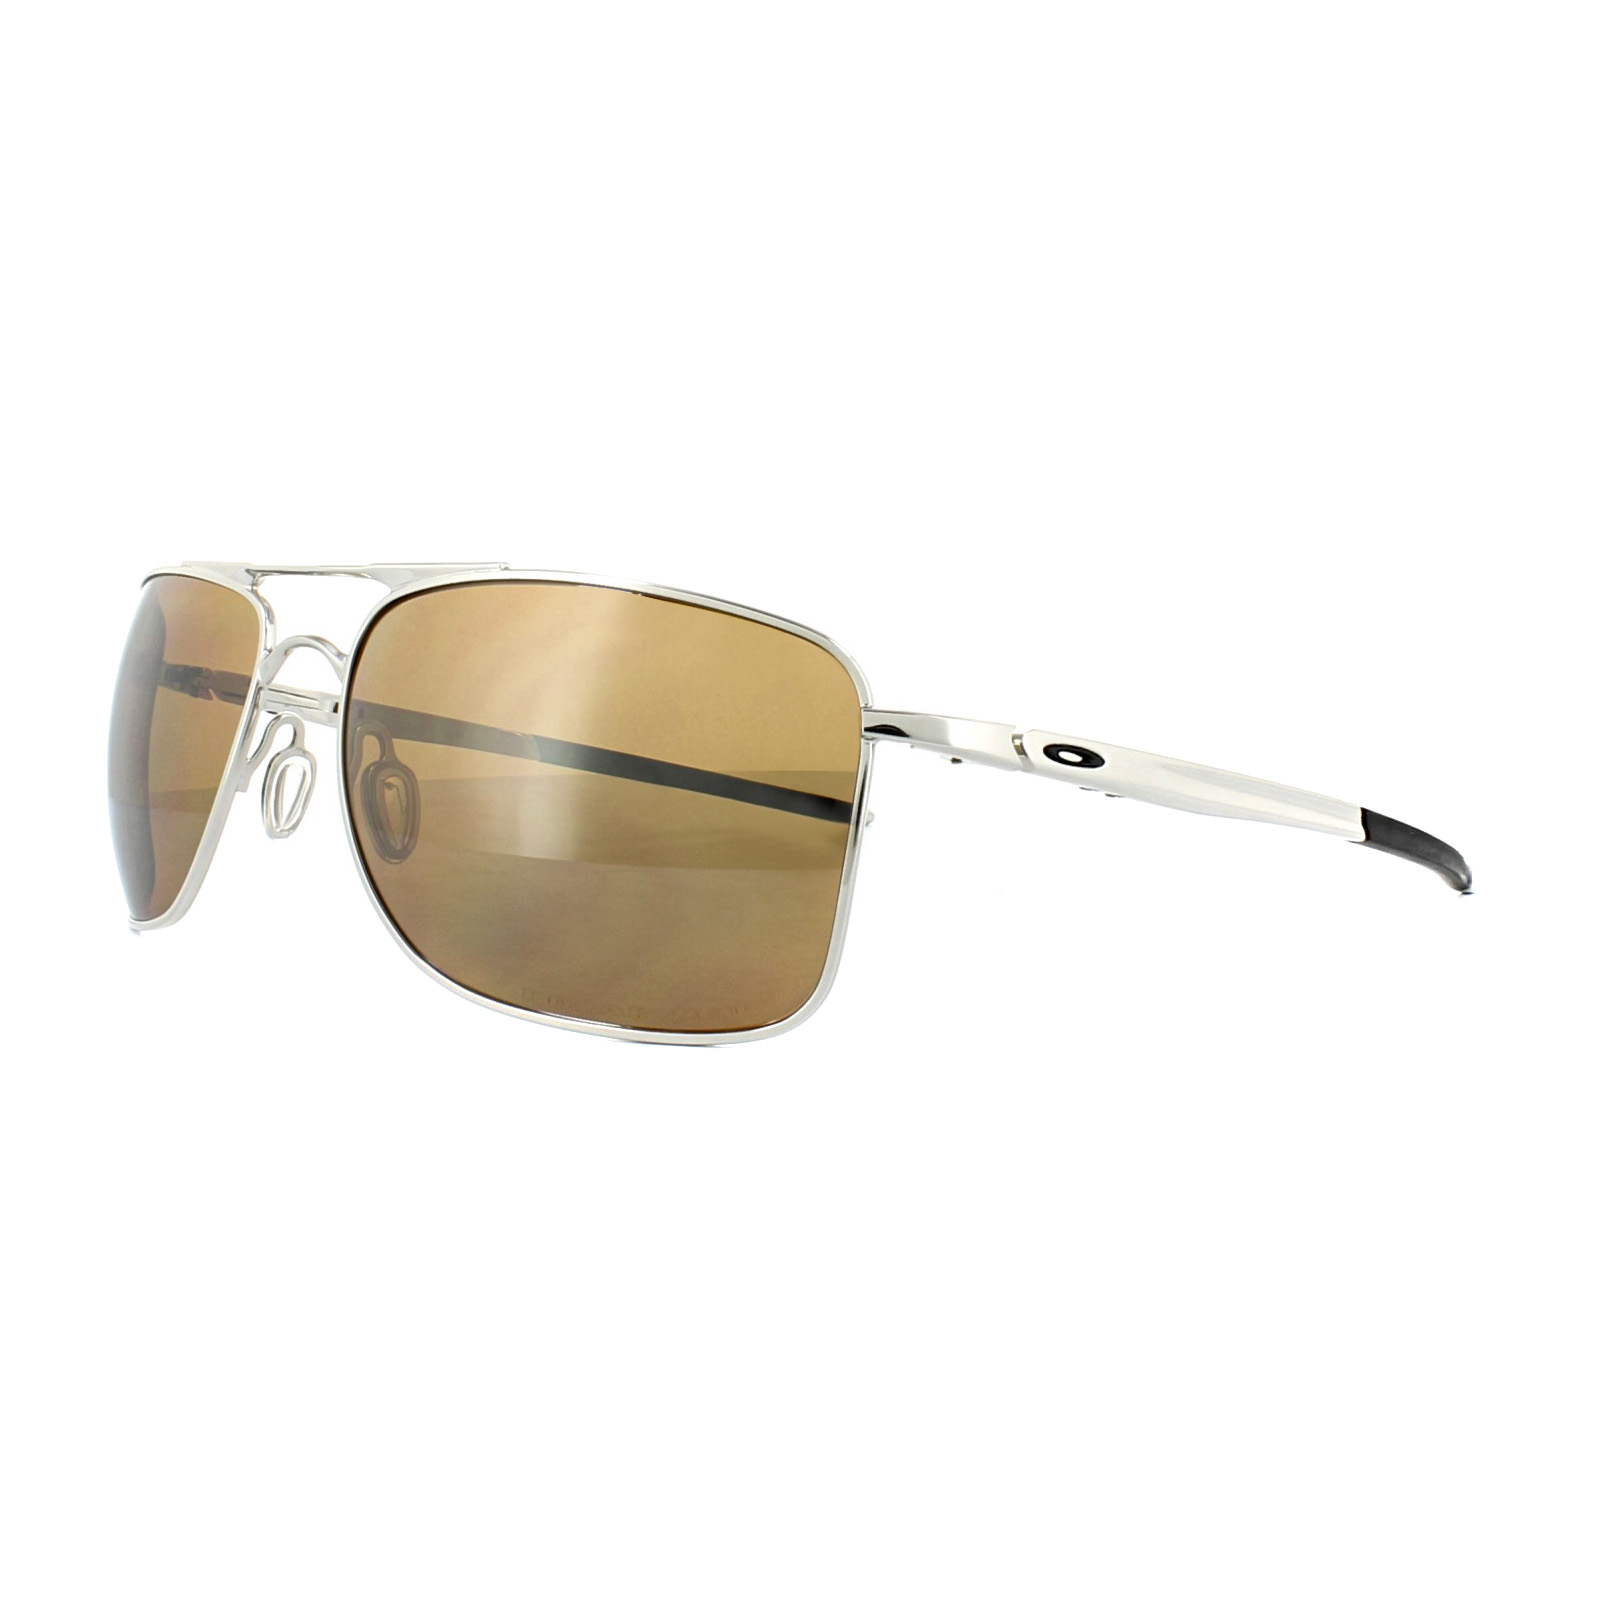 ca2a6b0c96 Sentinel Oakley Sunglasses Gauge 8 L OO4124-05 Polished Chrome Tungsten  Iridium Polarized